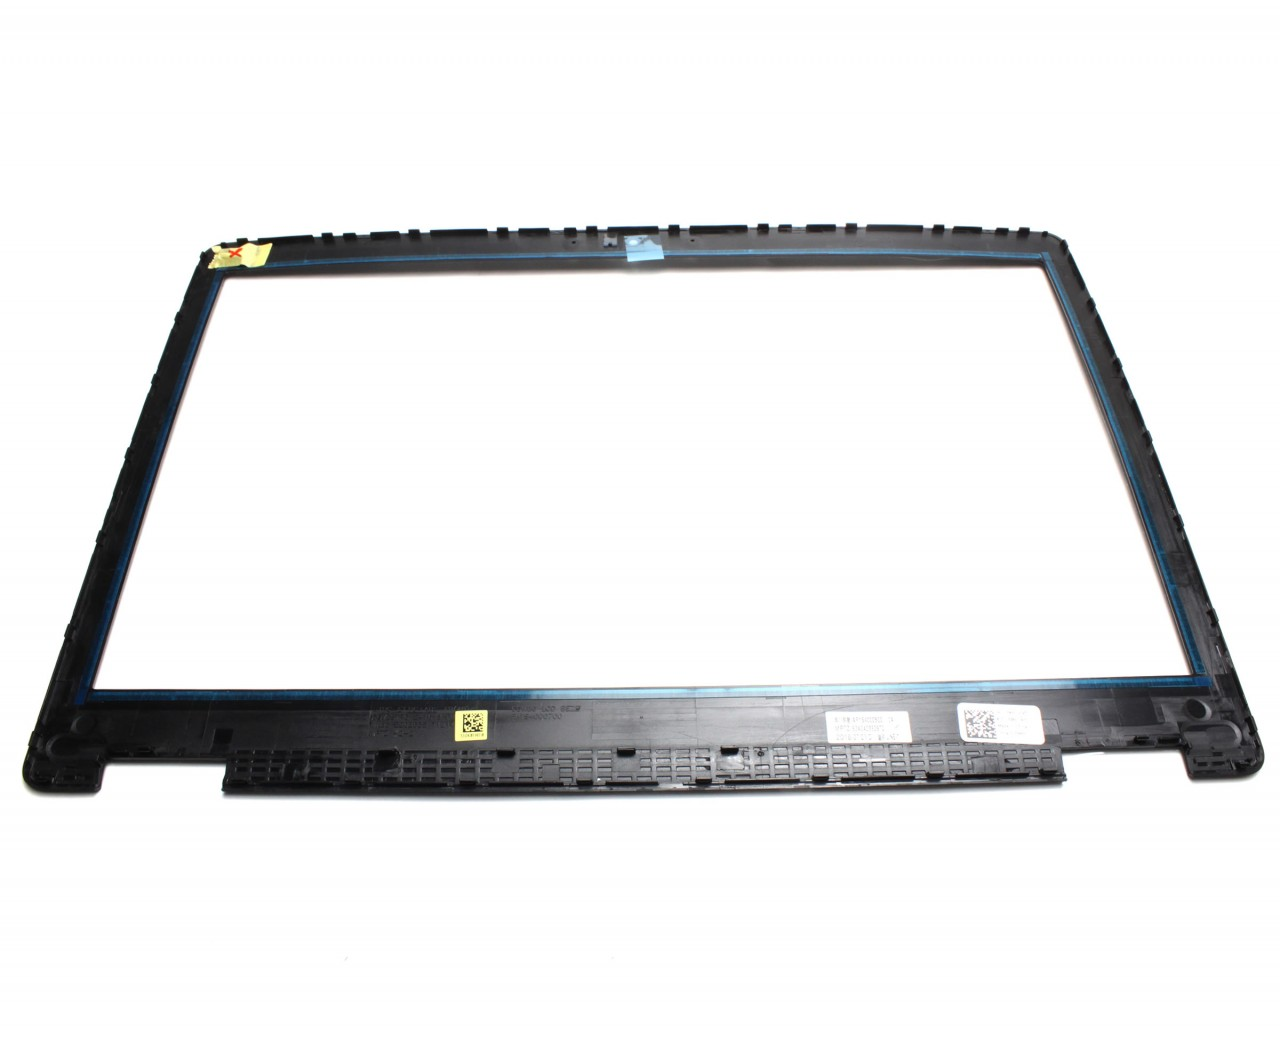 Rama Display Dell Precision 3520 Bezel Front Cover Neagra imagine powerlaptop.ro 2021